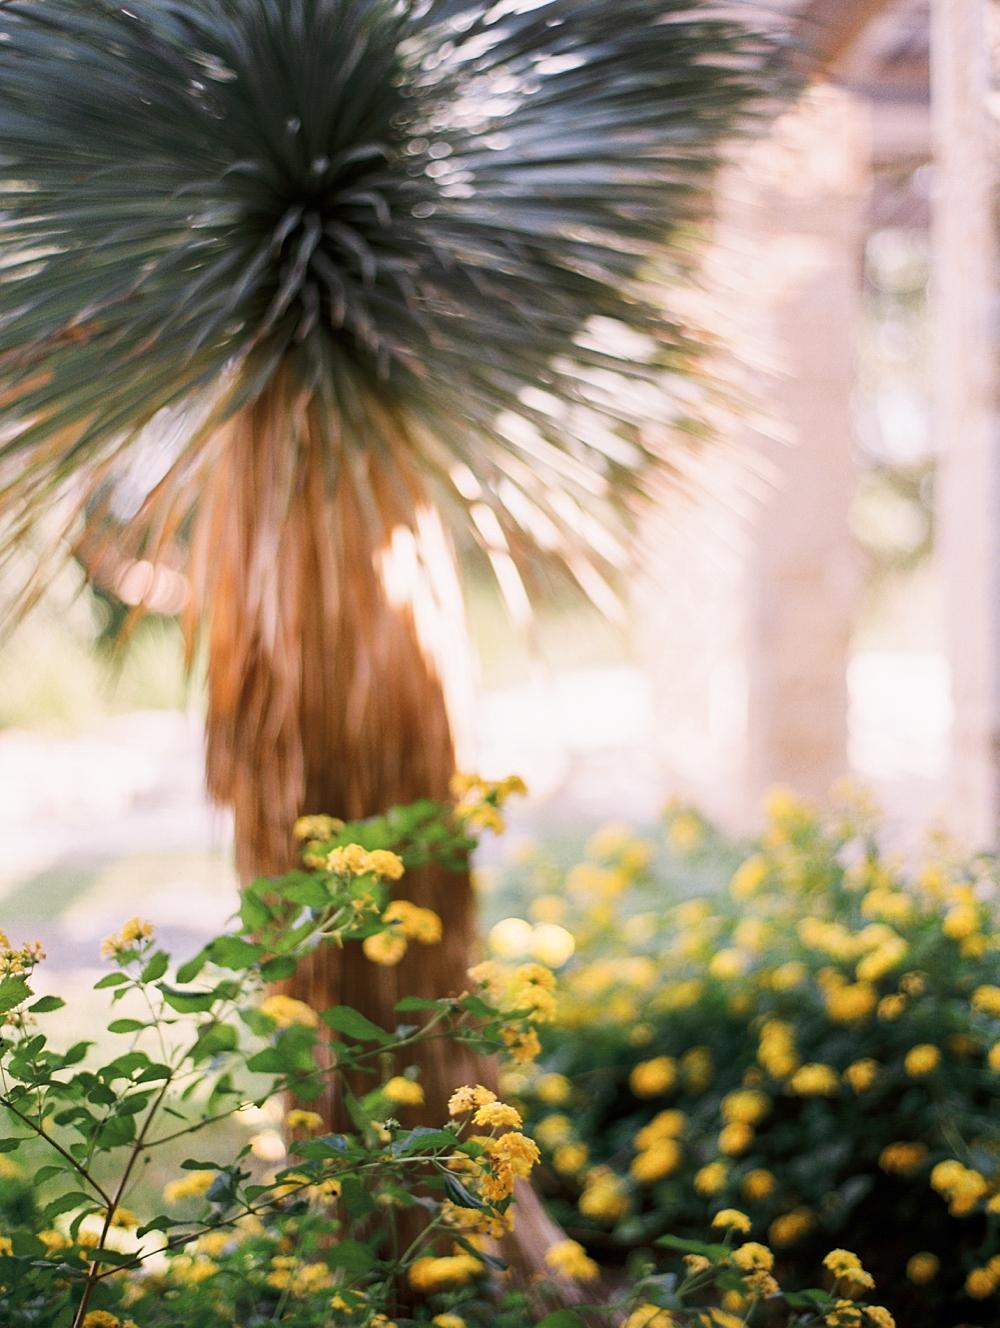 kristin-la-voie-photography-AUSTIN-WEDDING-PHOTOGRAPHER-BEST-IN-TEXAS-113